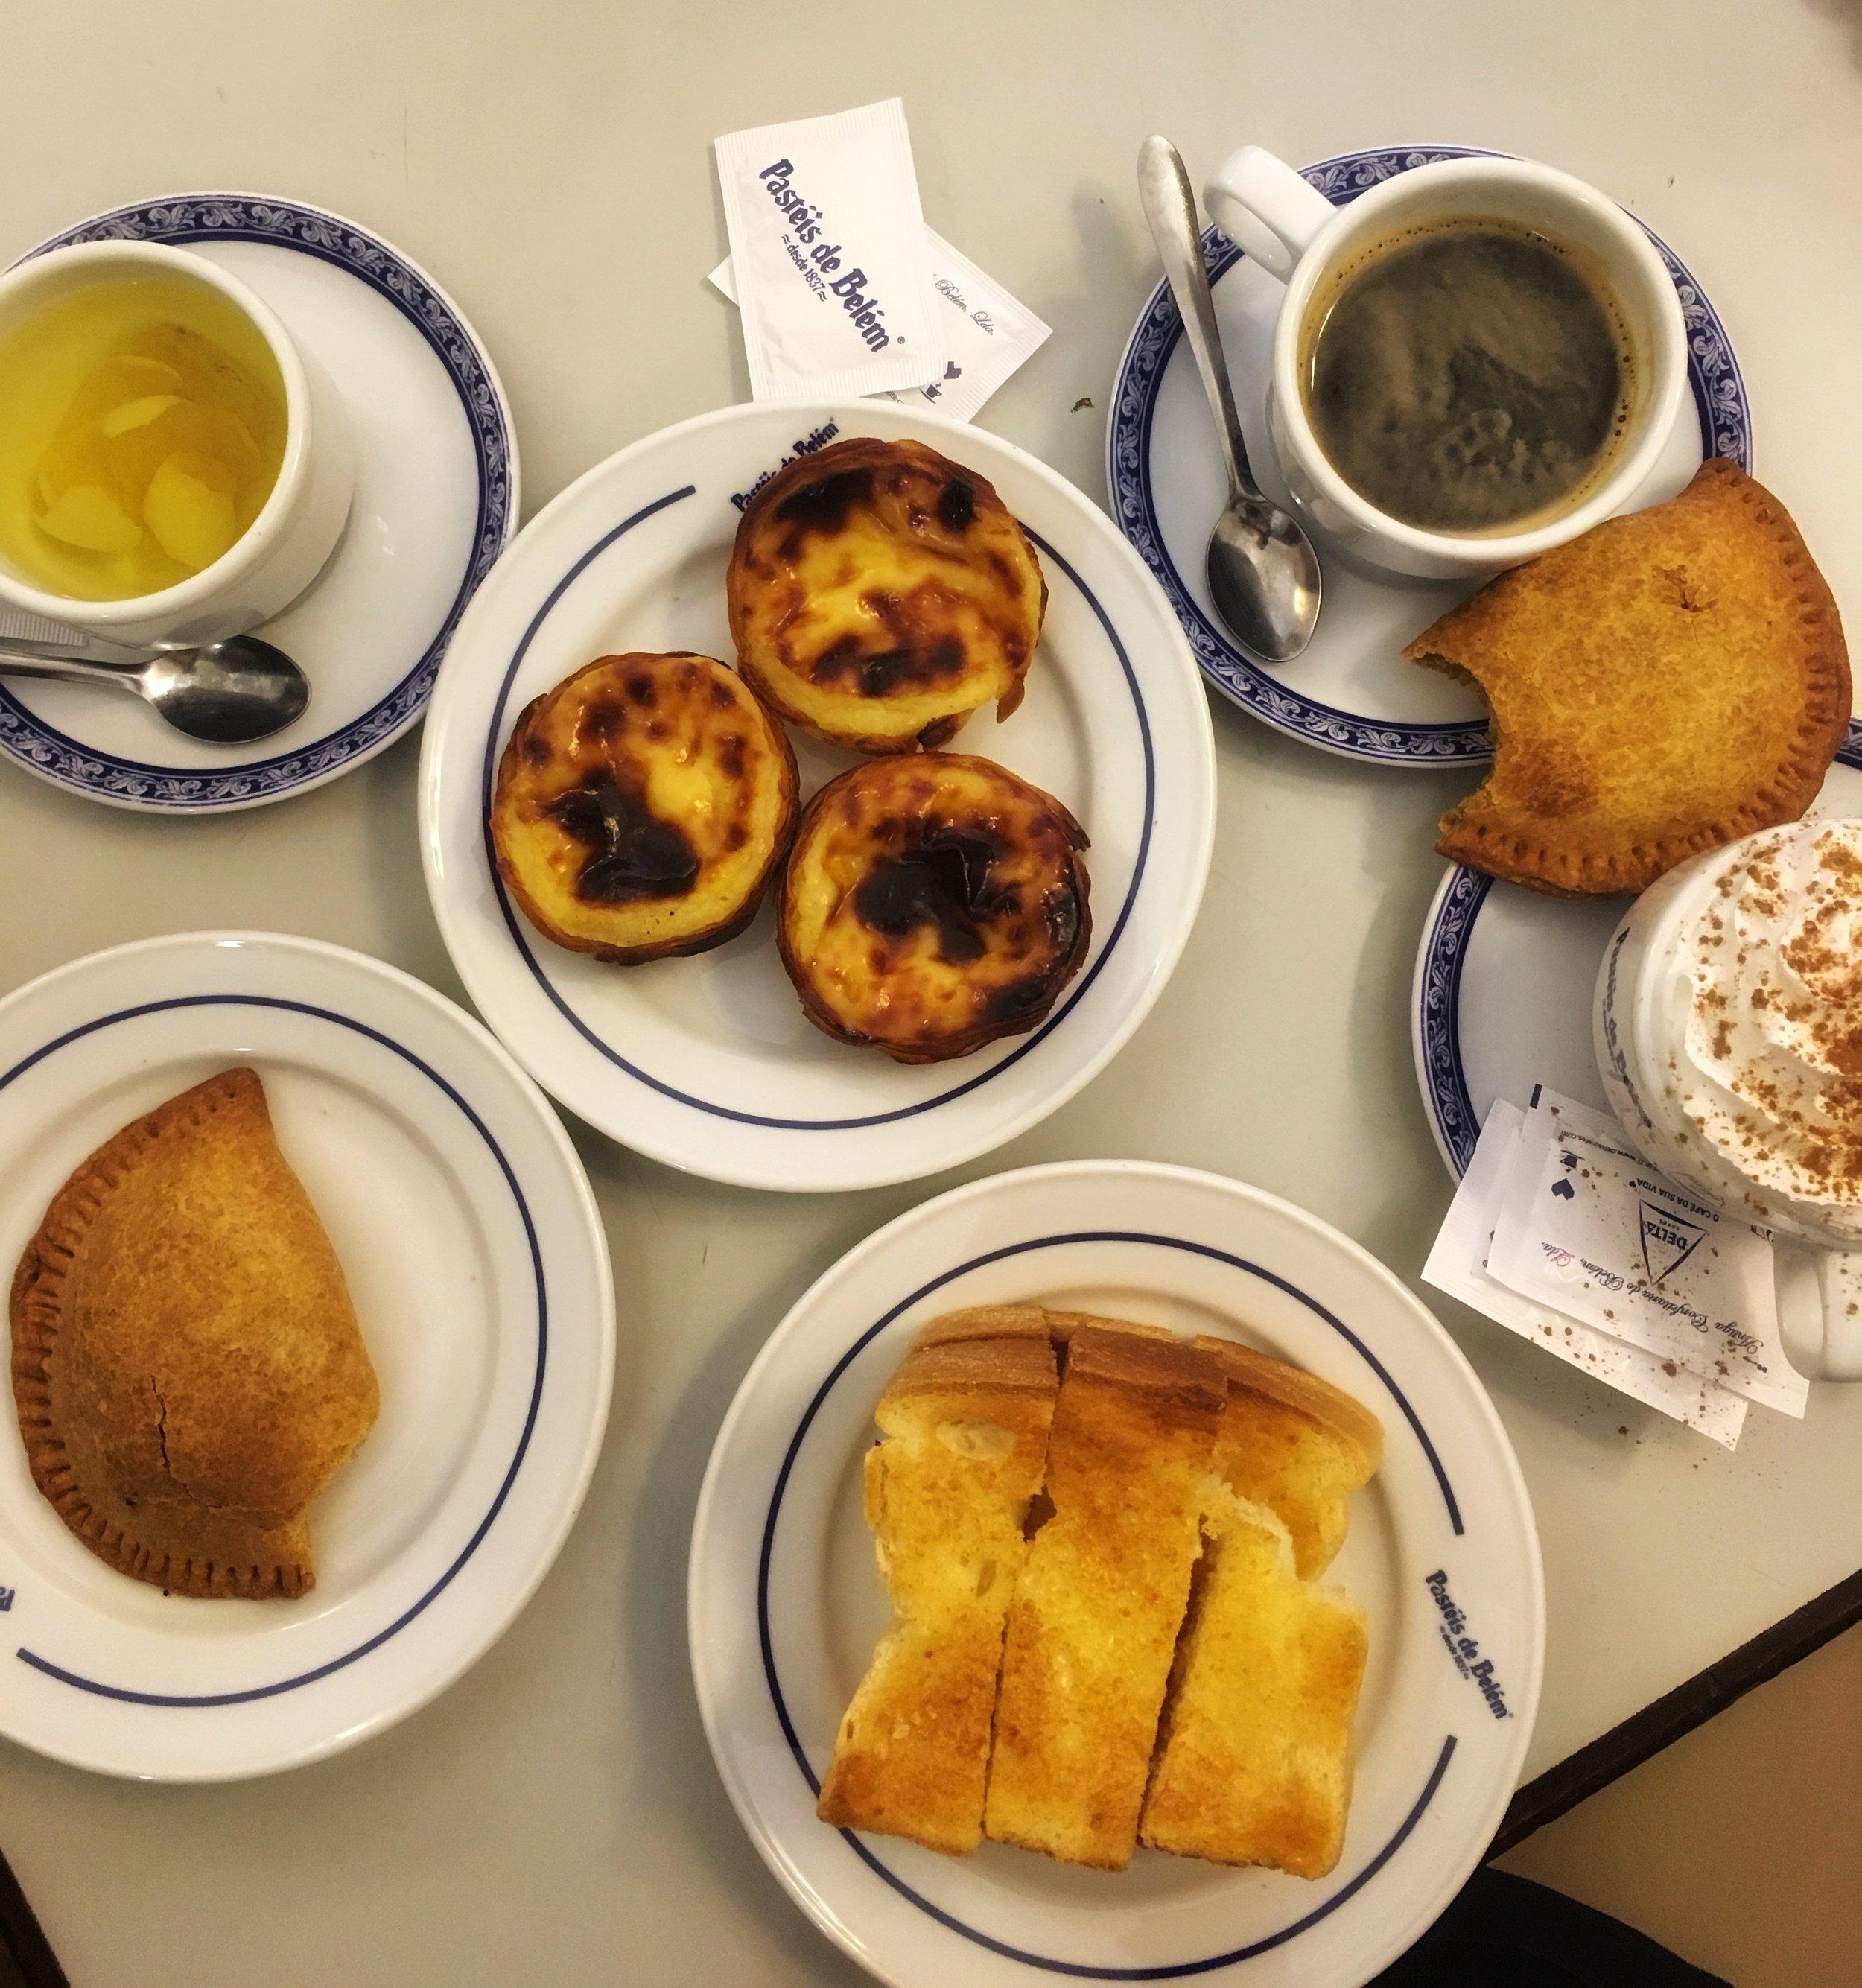 My breakfast at Antiga Confeitaria de Belém